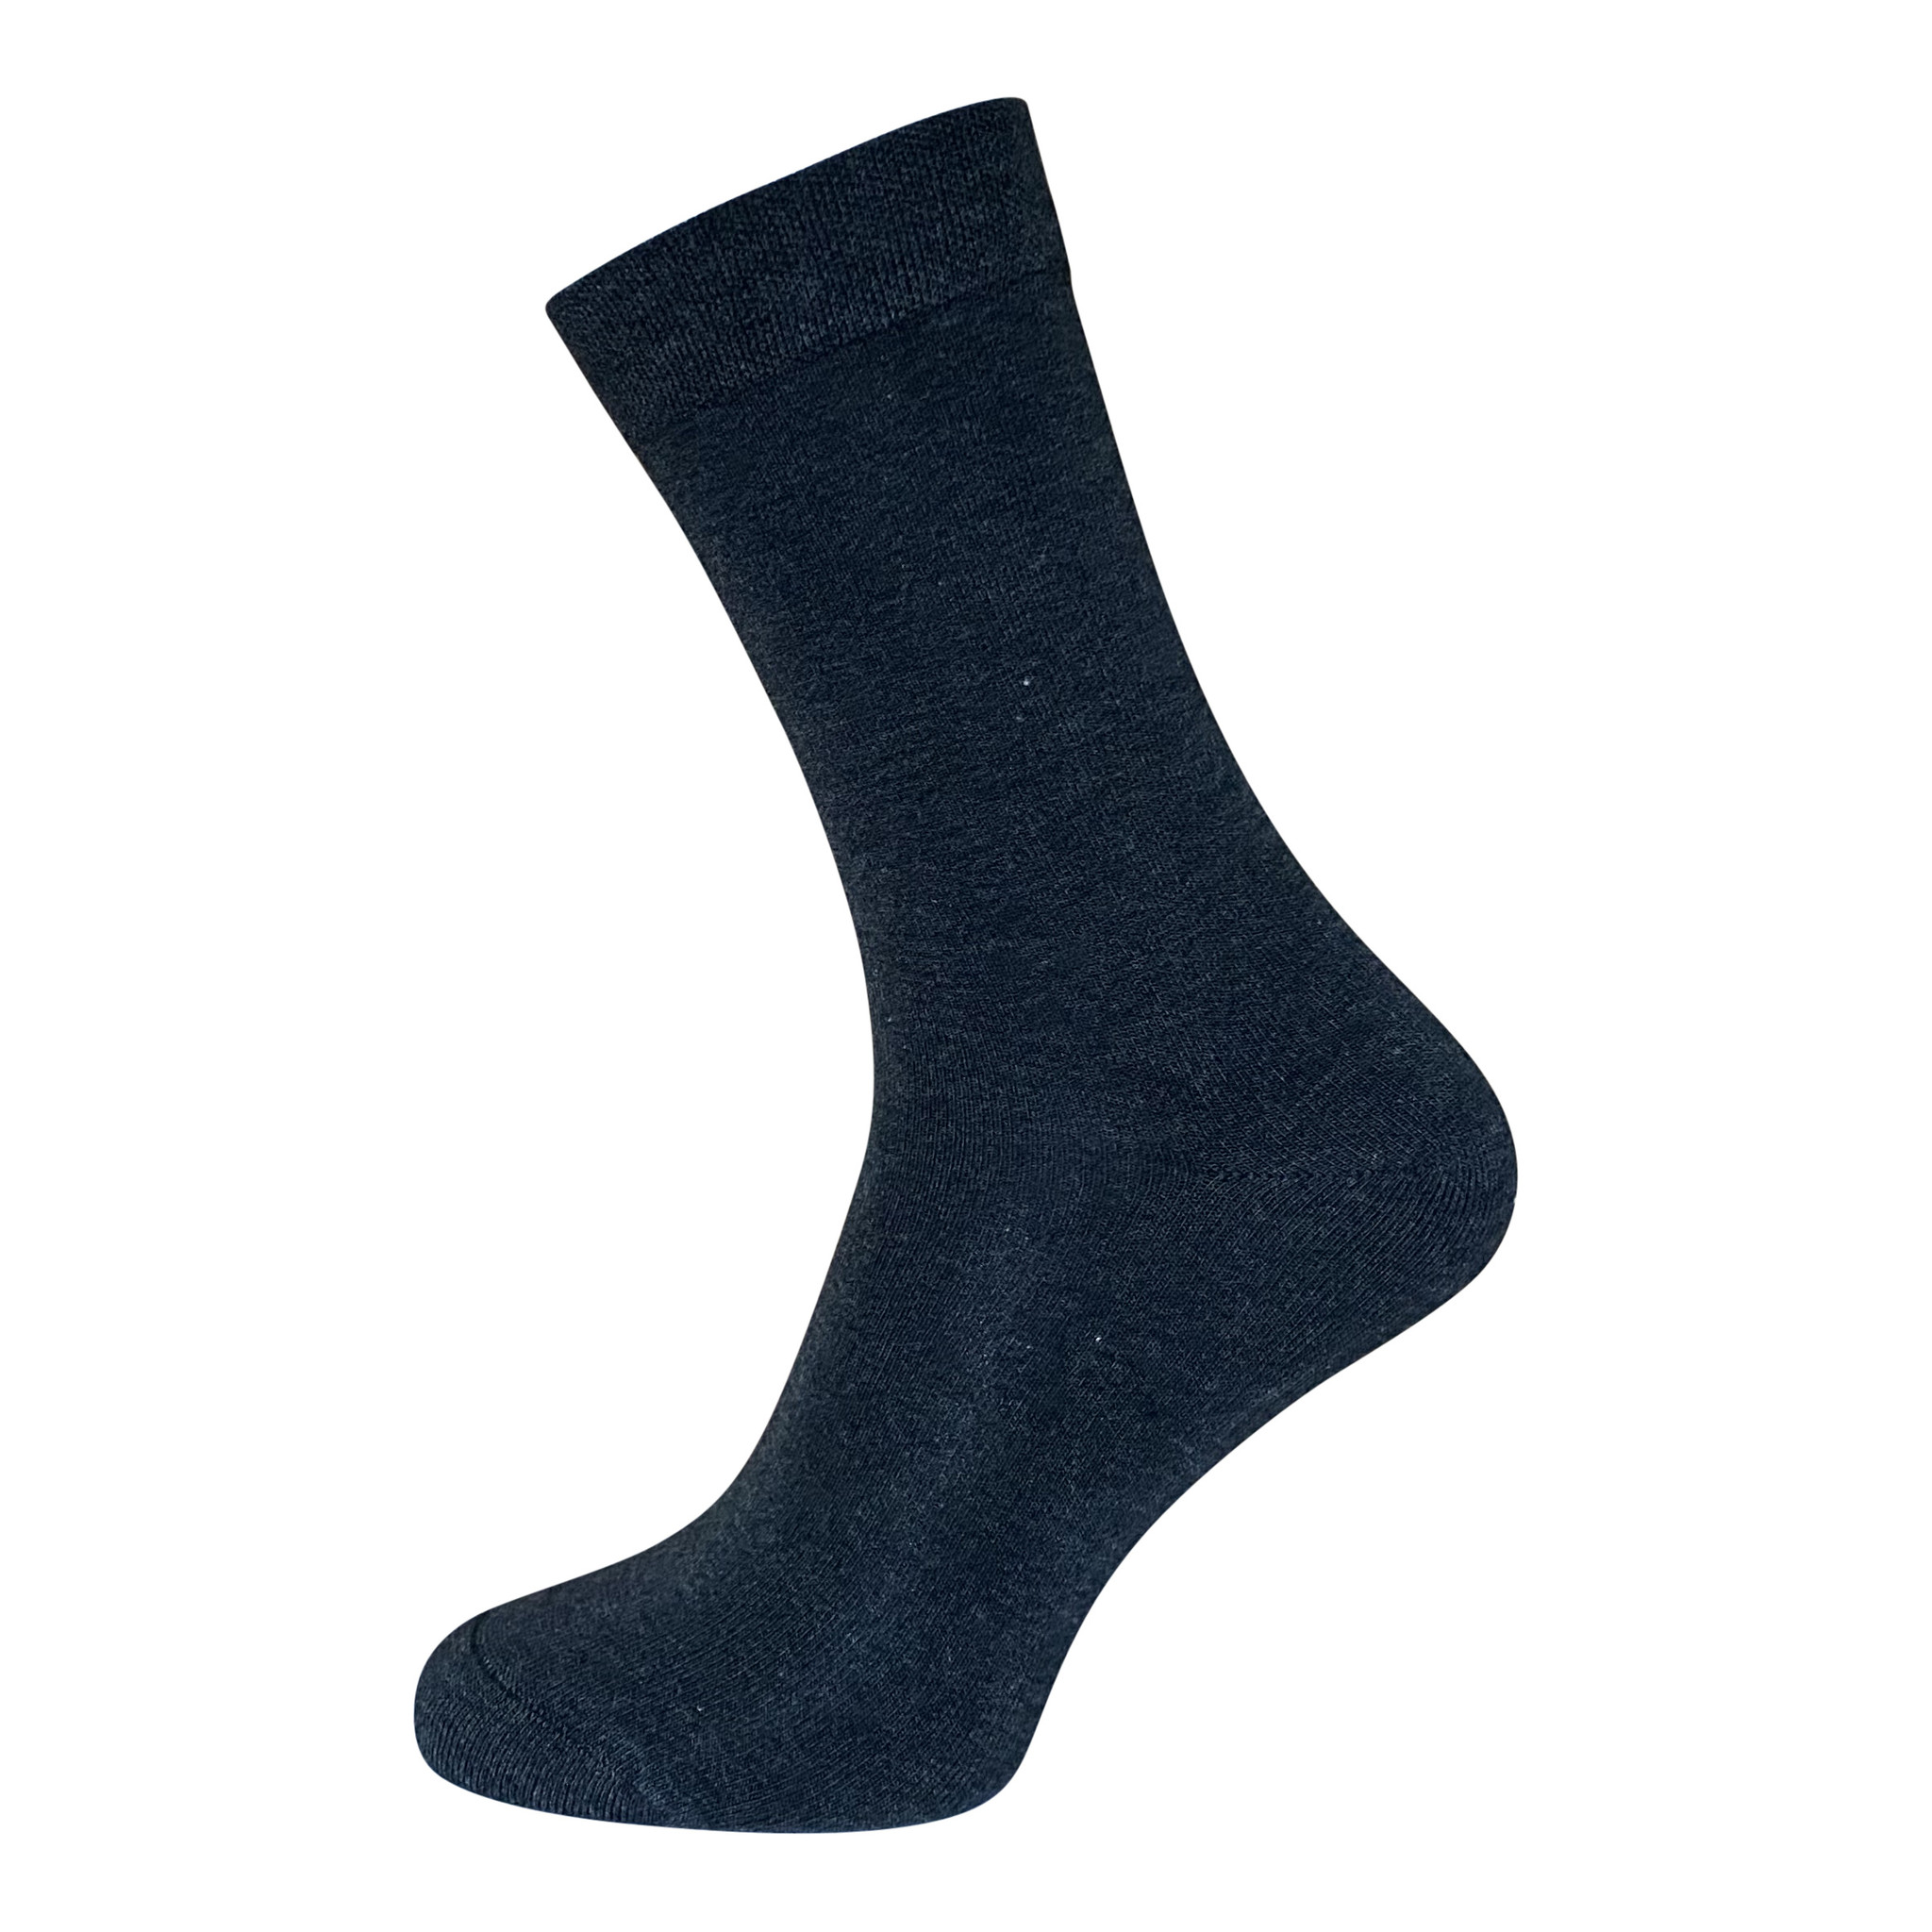 Boru sokken Boru Bamboe sokken - antraciet